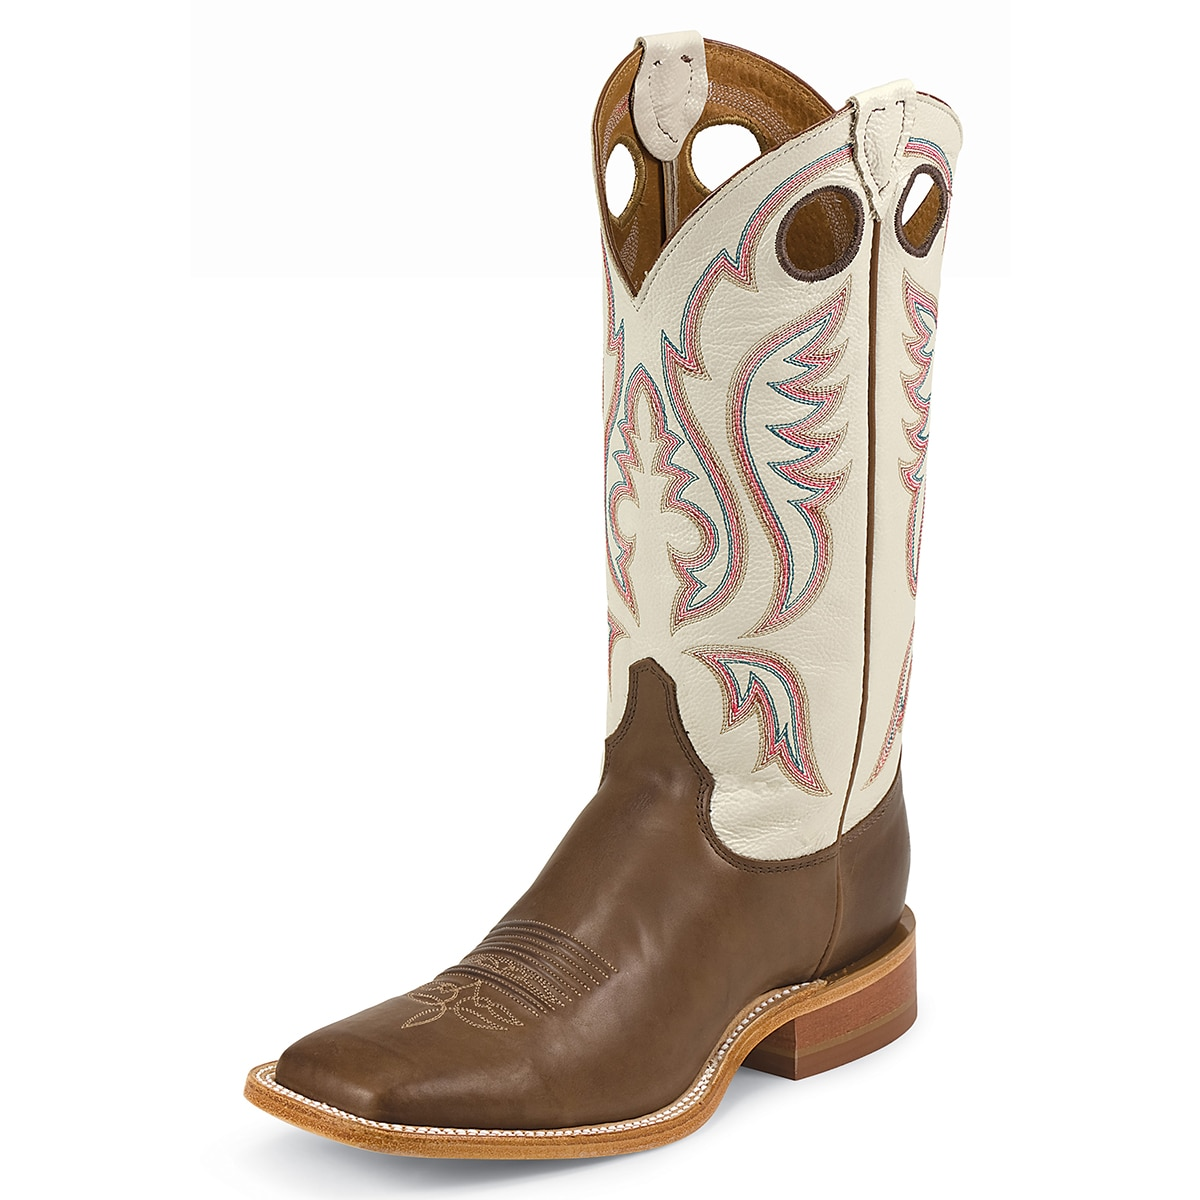 Justin Men's Bent Rail Stillwater Boots - Chocolate